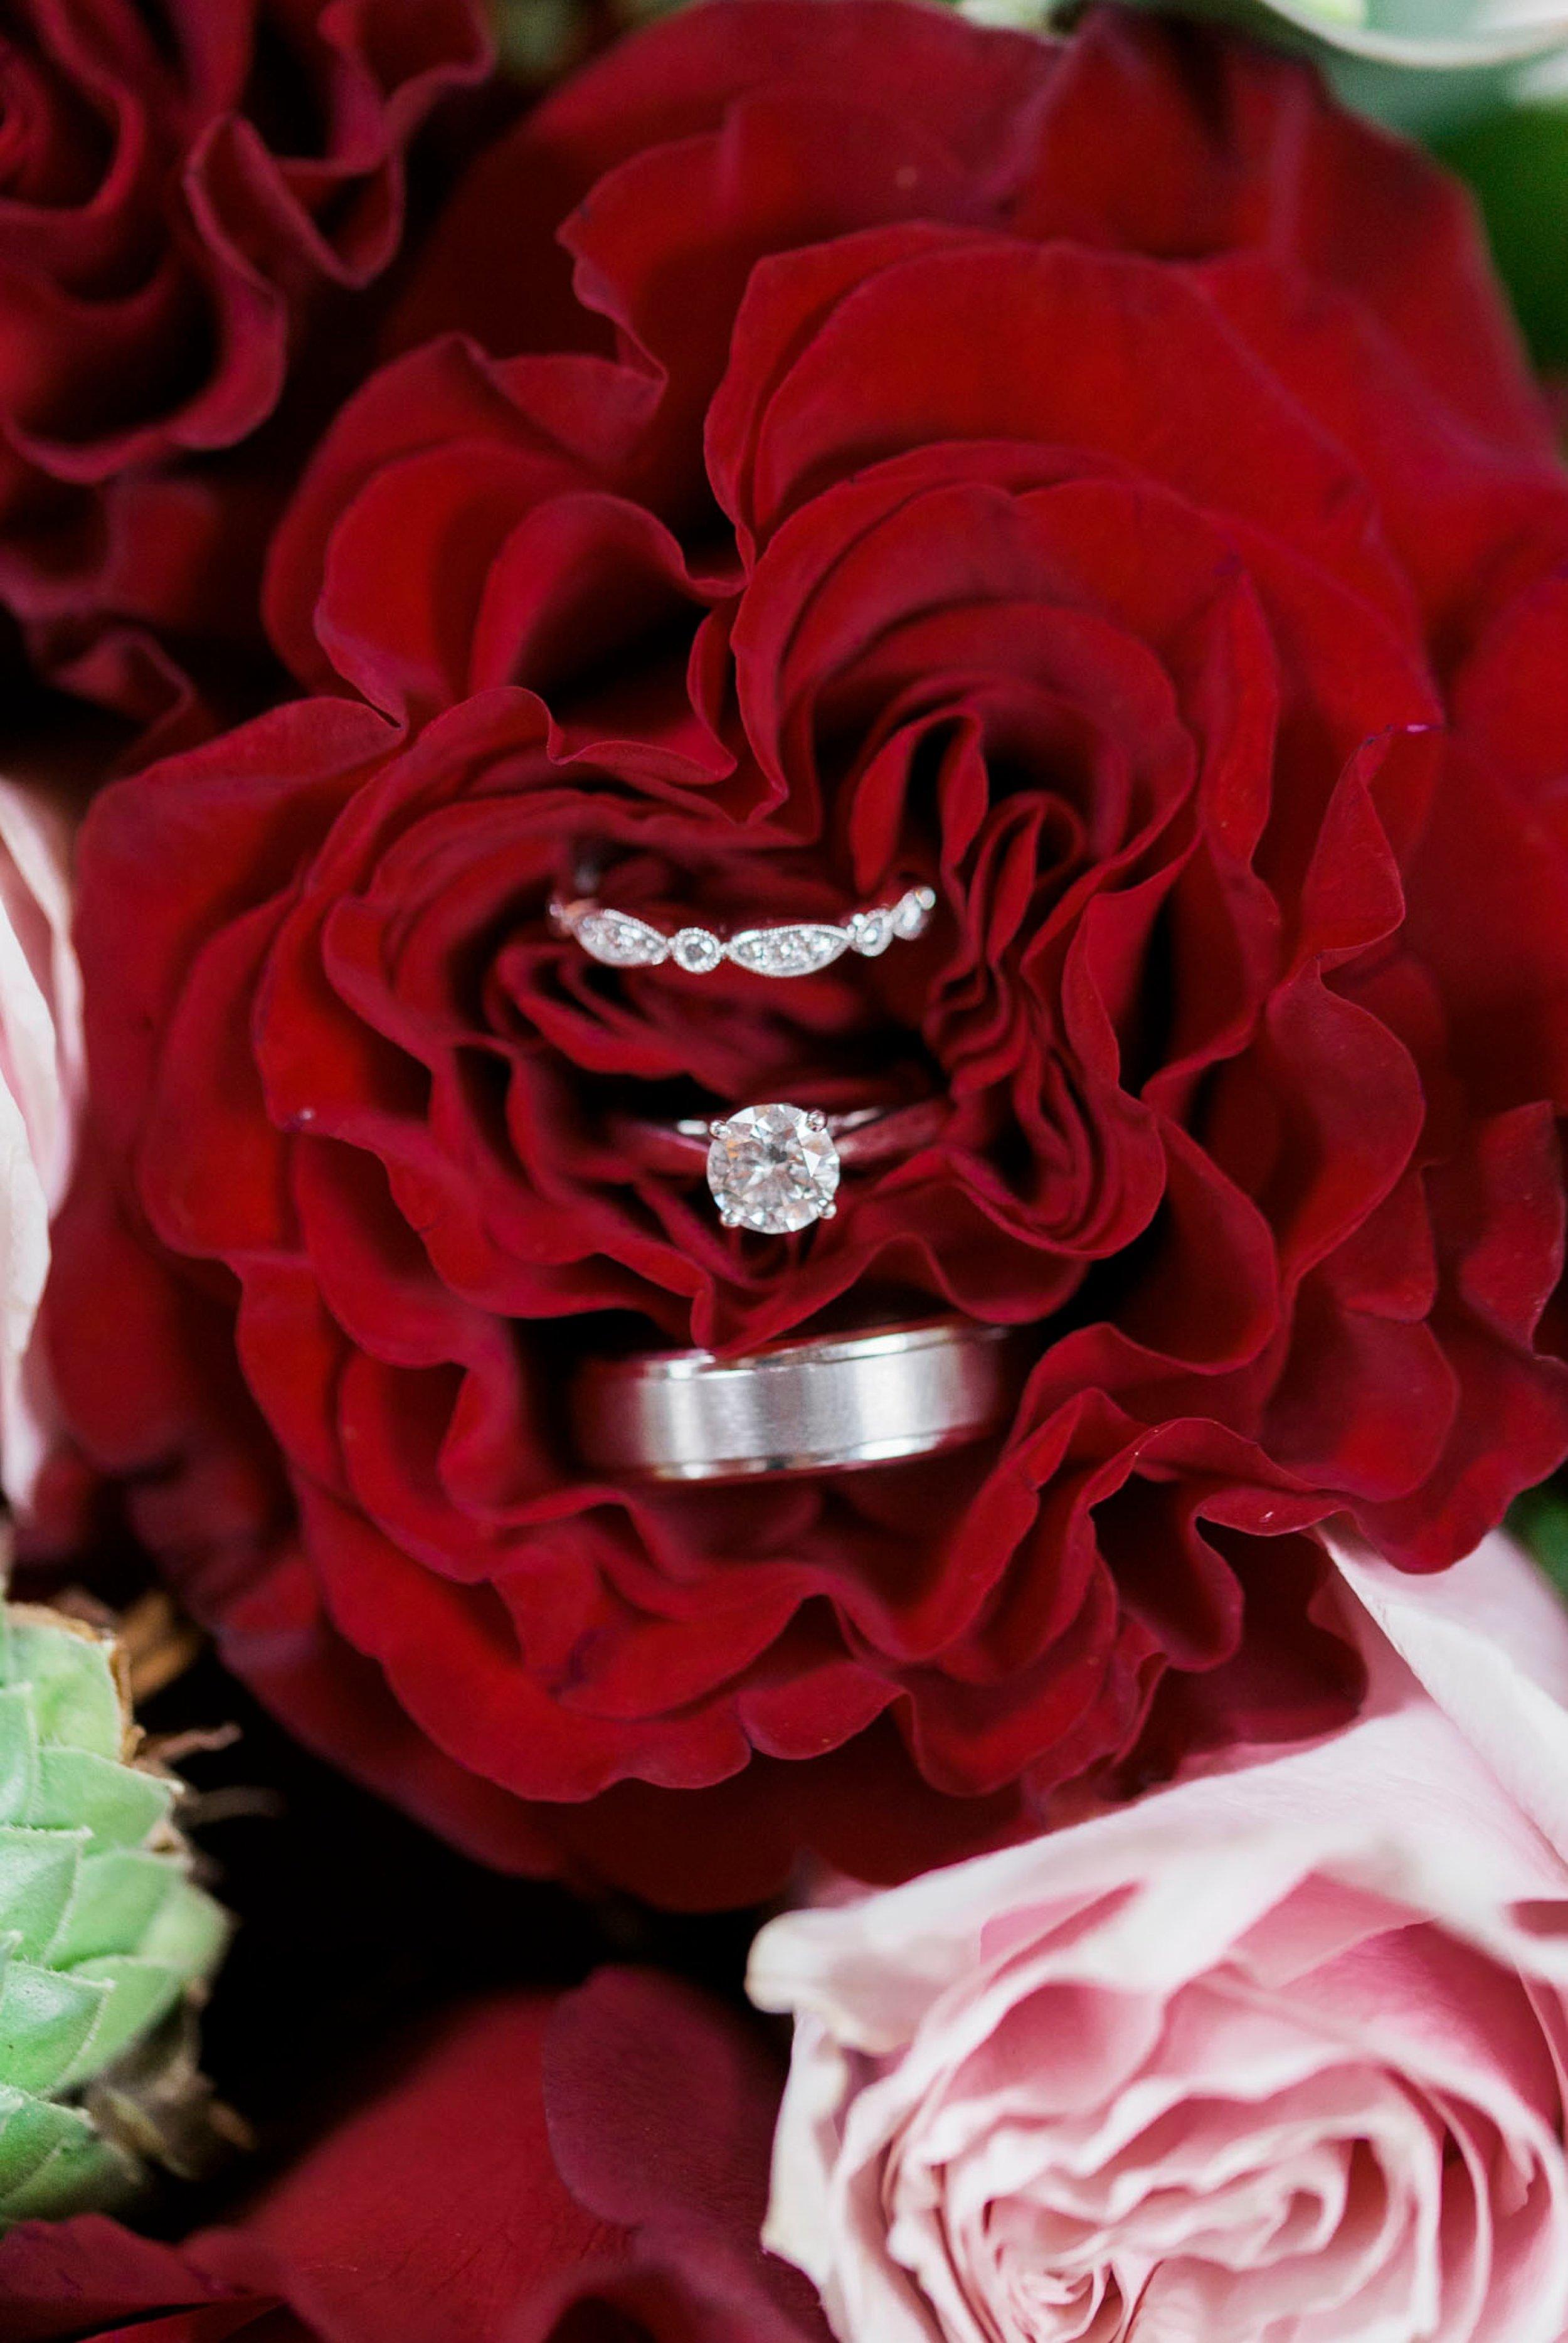 IrvineEstate_LexingtonVA_Wedding_FallWedding_VirginiaWeddingPhotographer 4.jpg